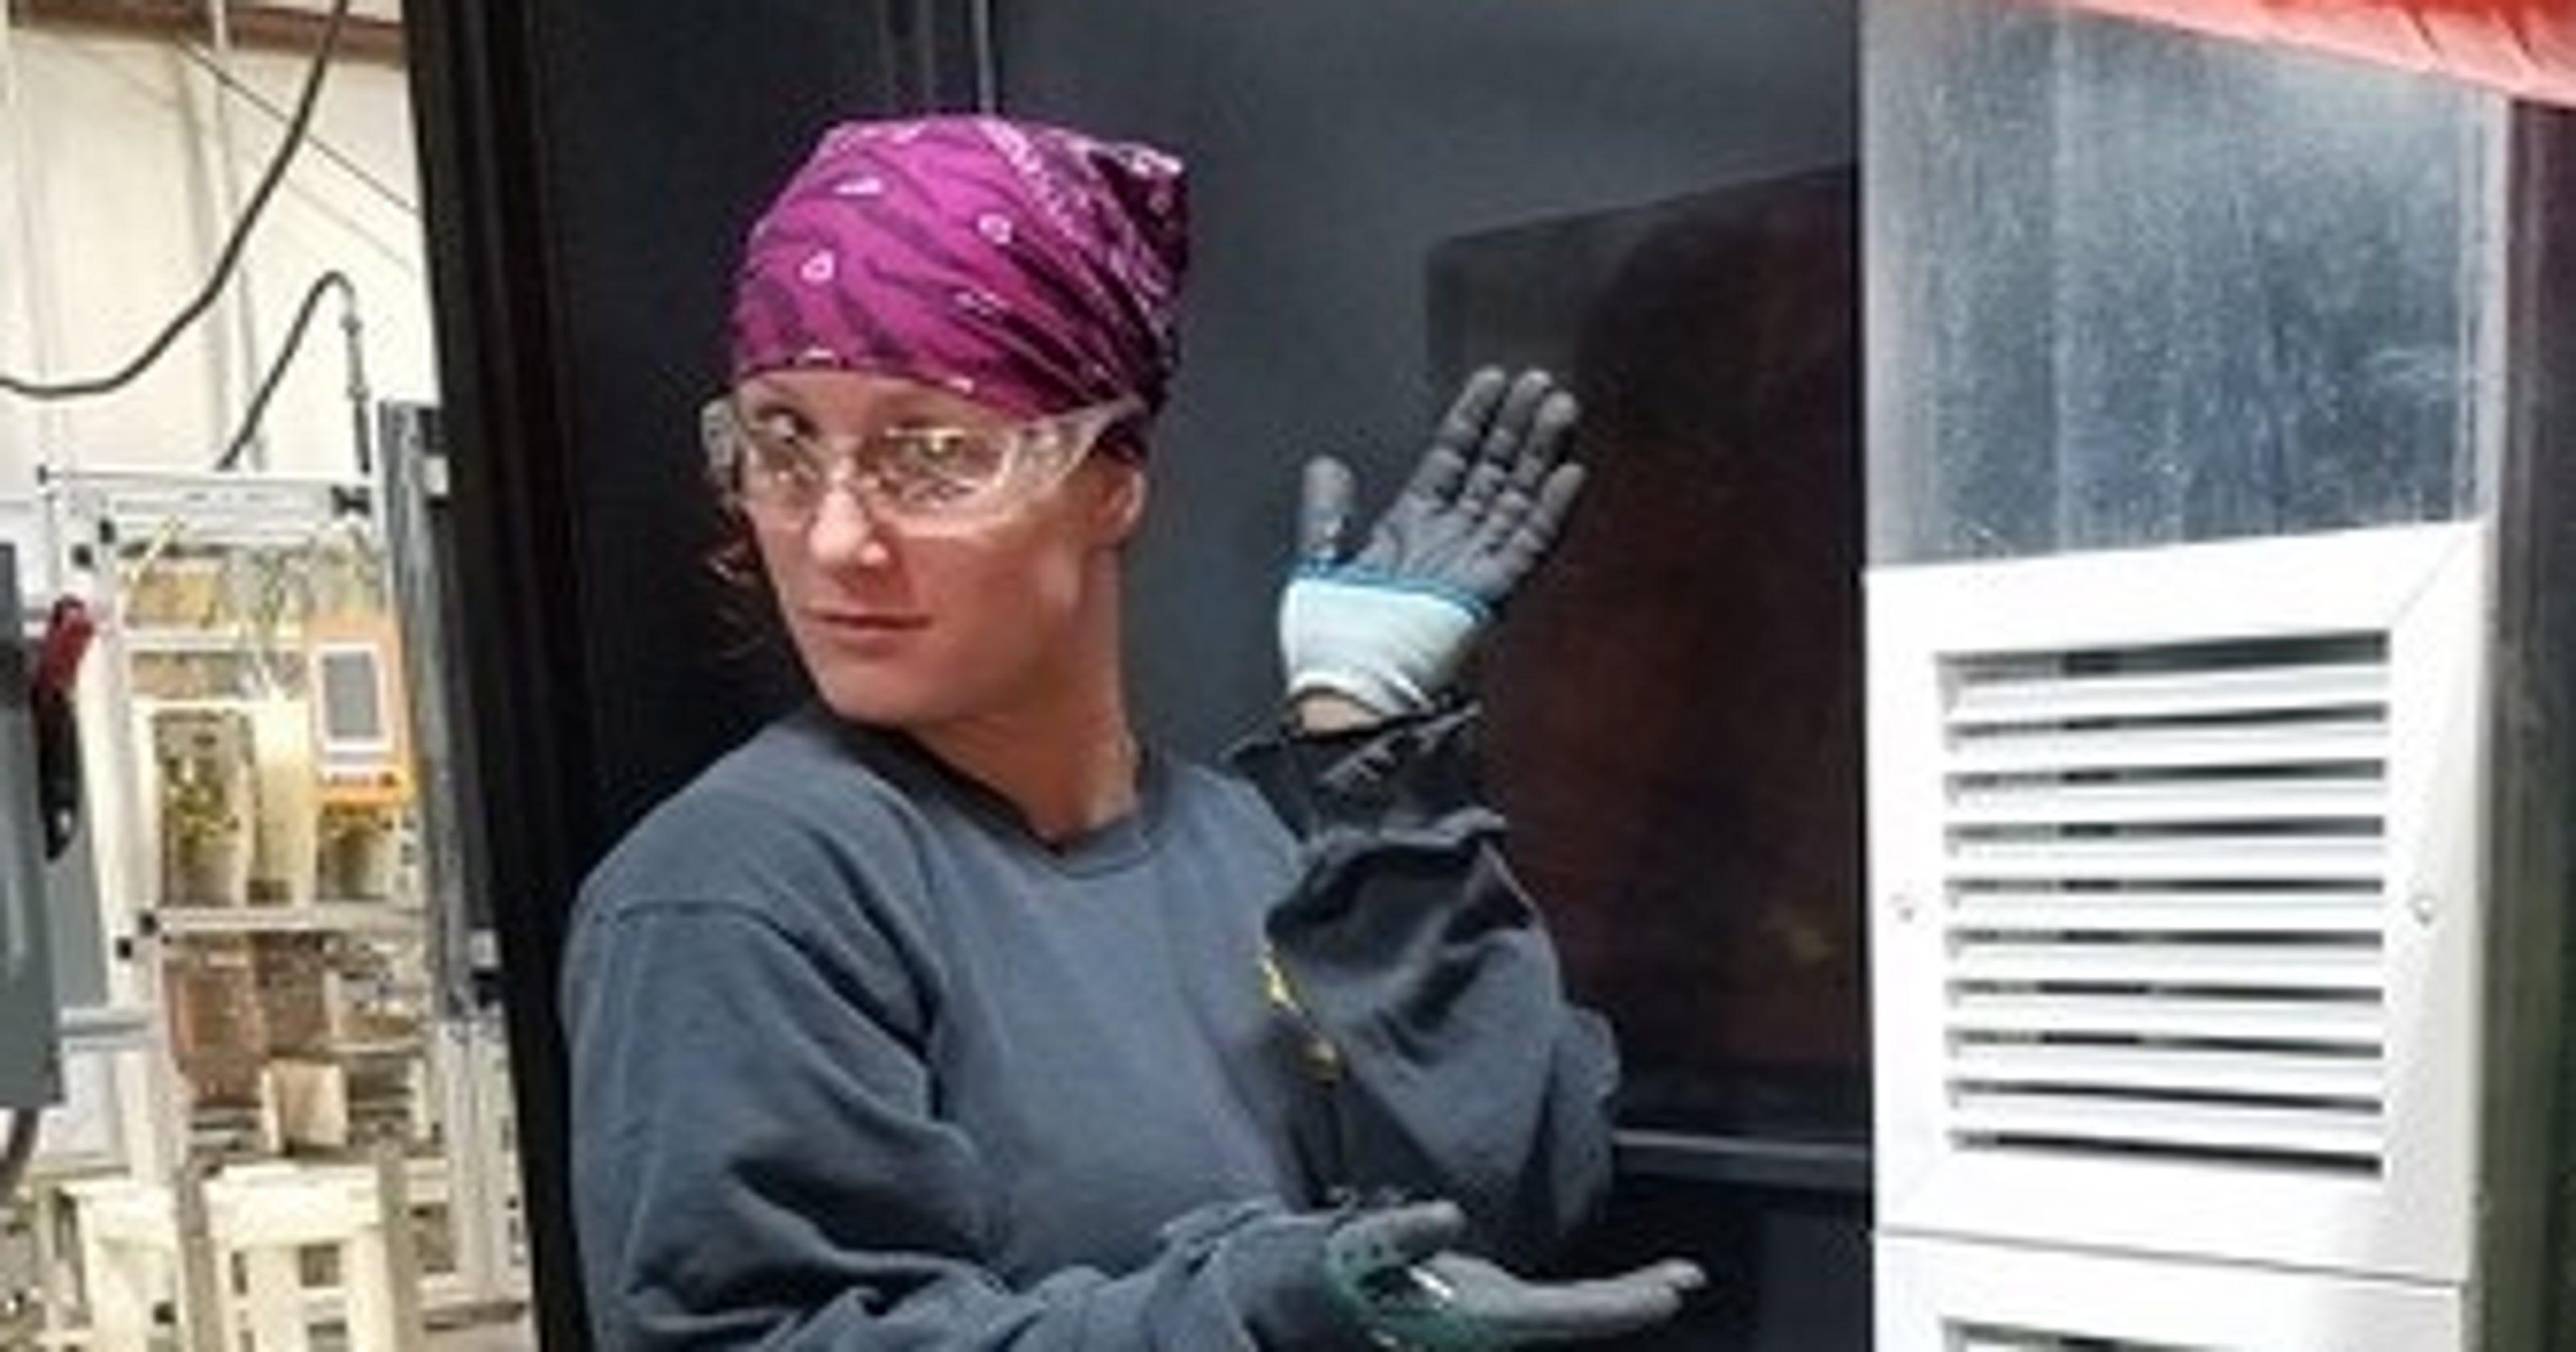 Sheet Metal Worker Expands Her Skills Job Opportunities